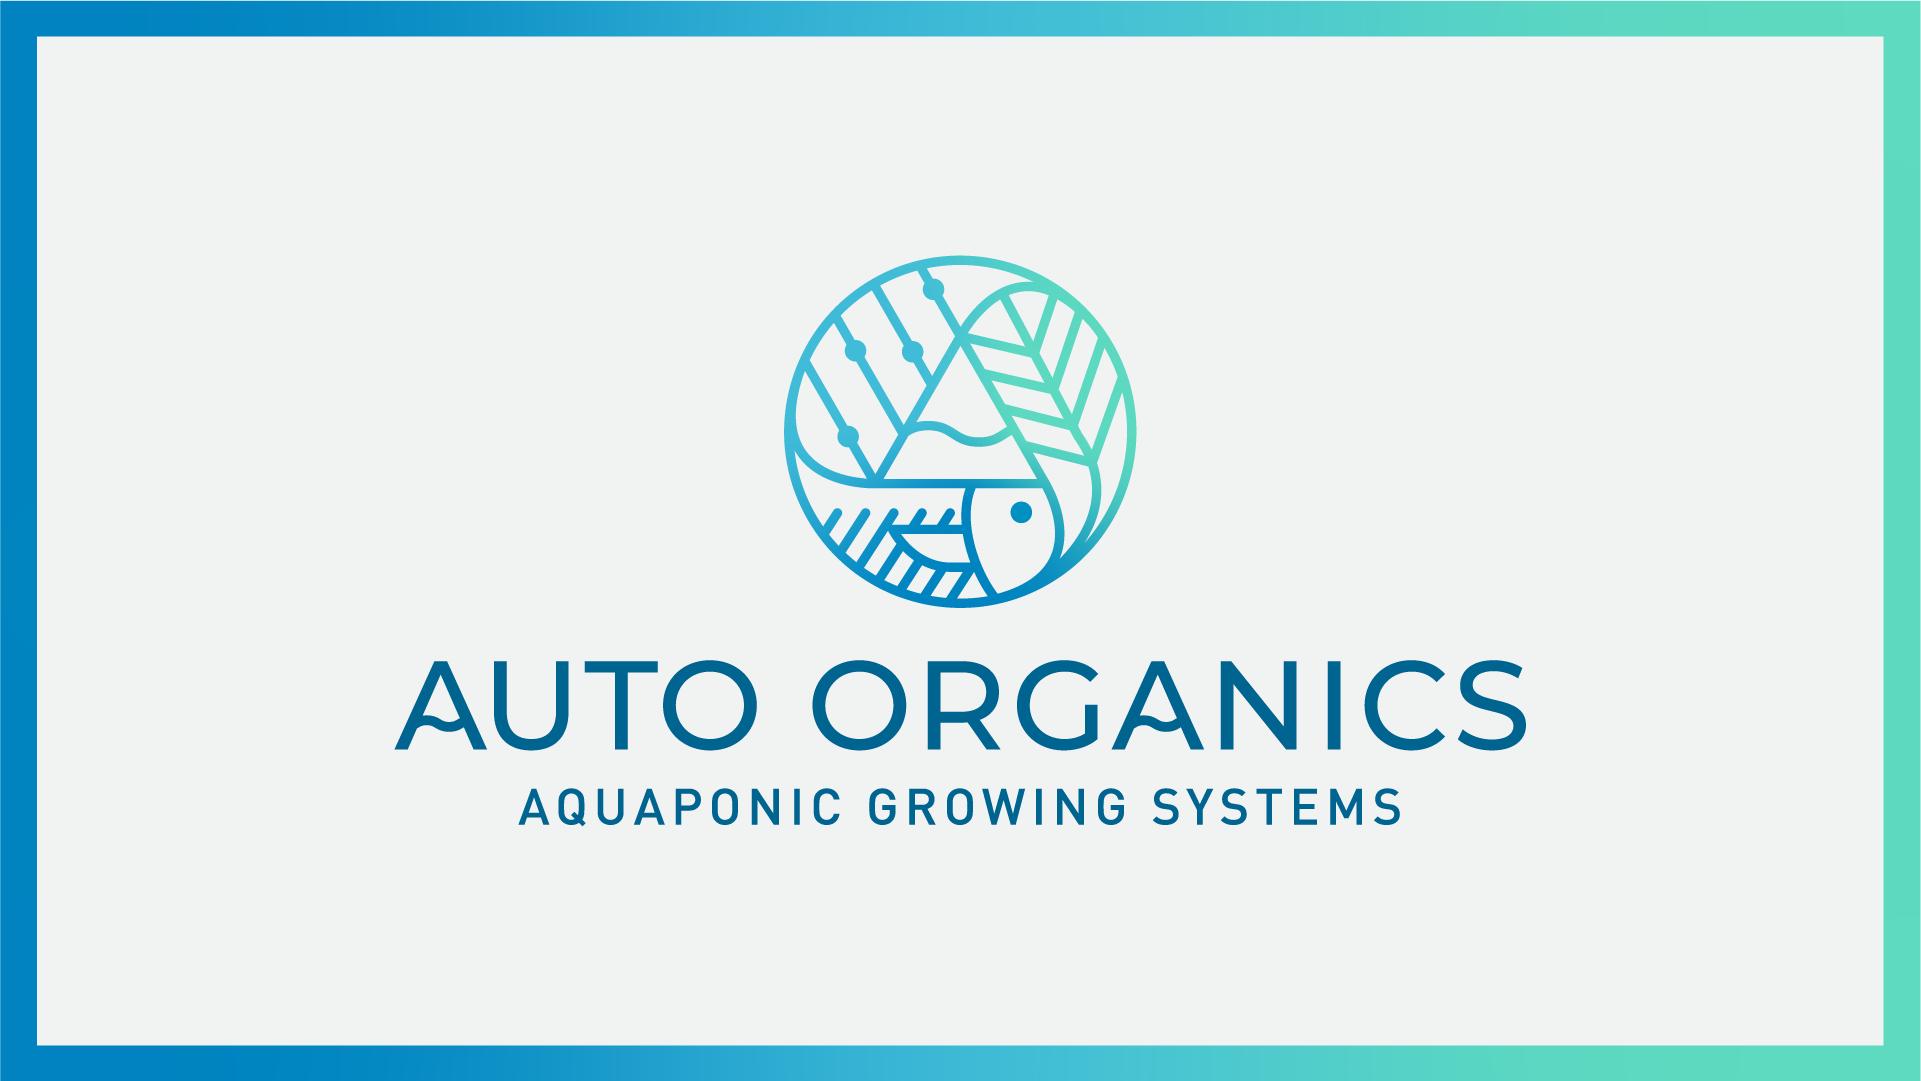 auto-organics-logo-brand-identity-03.png